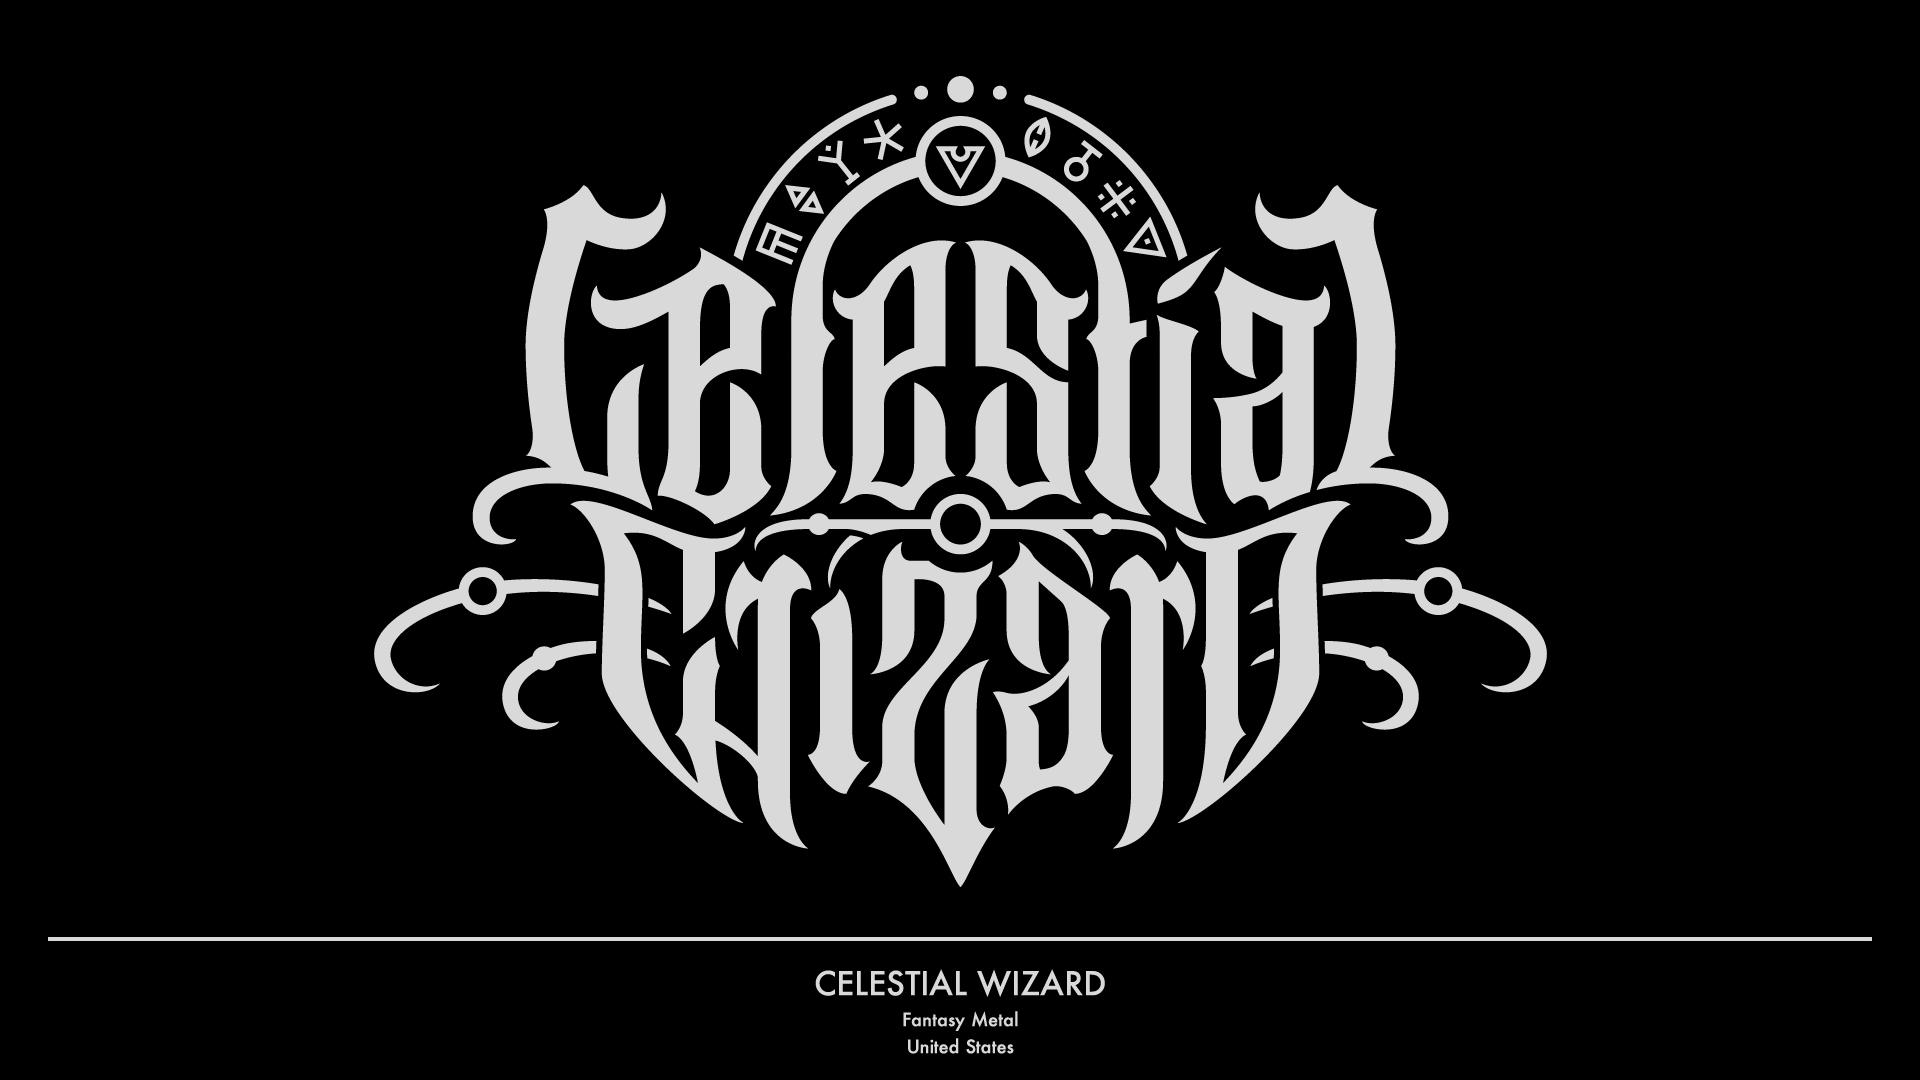 Celestial_Wizard.jpg